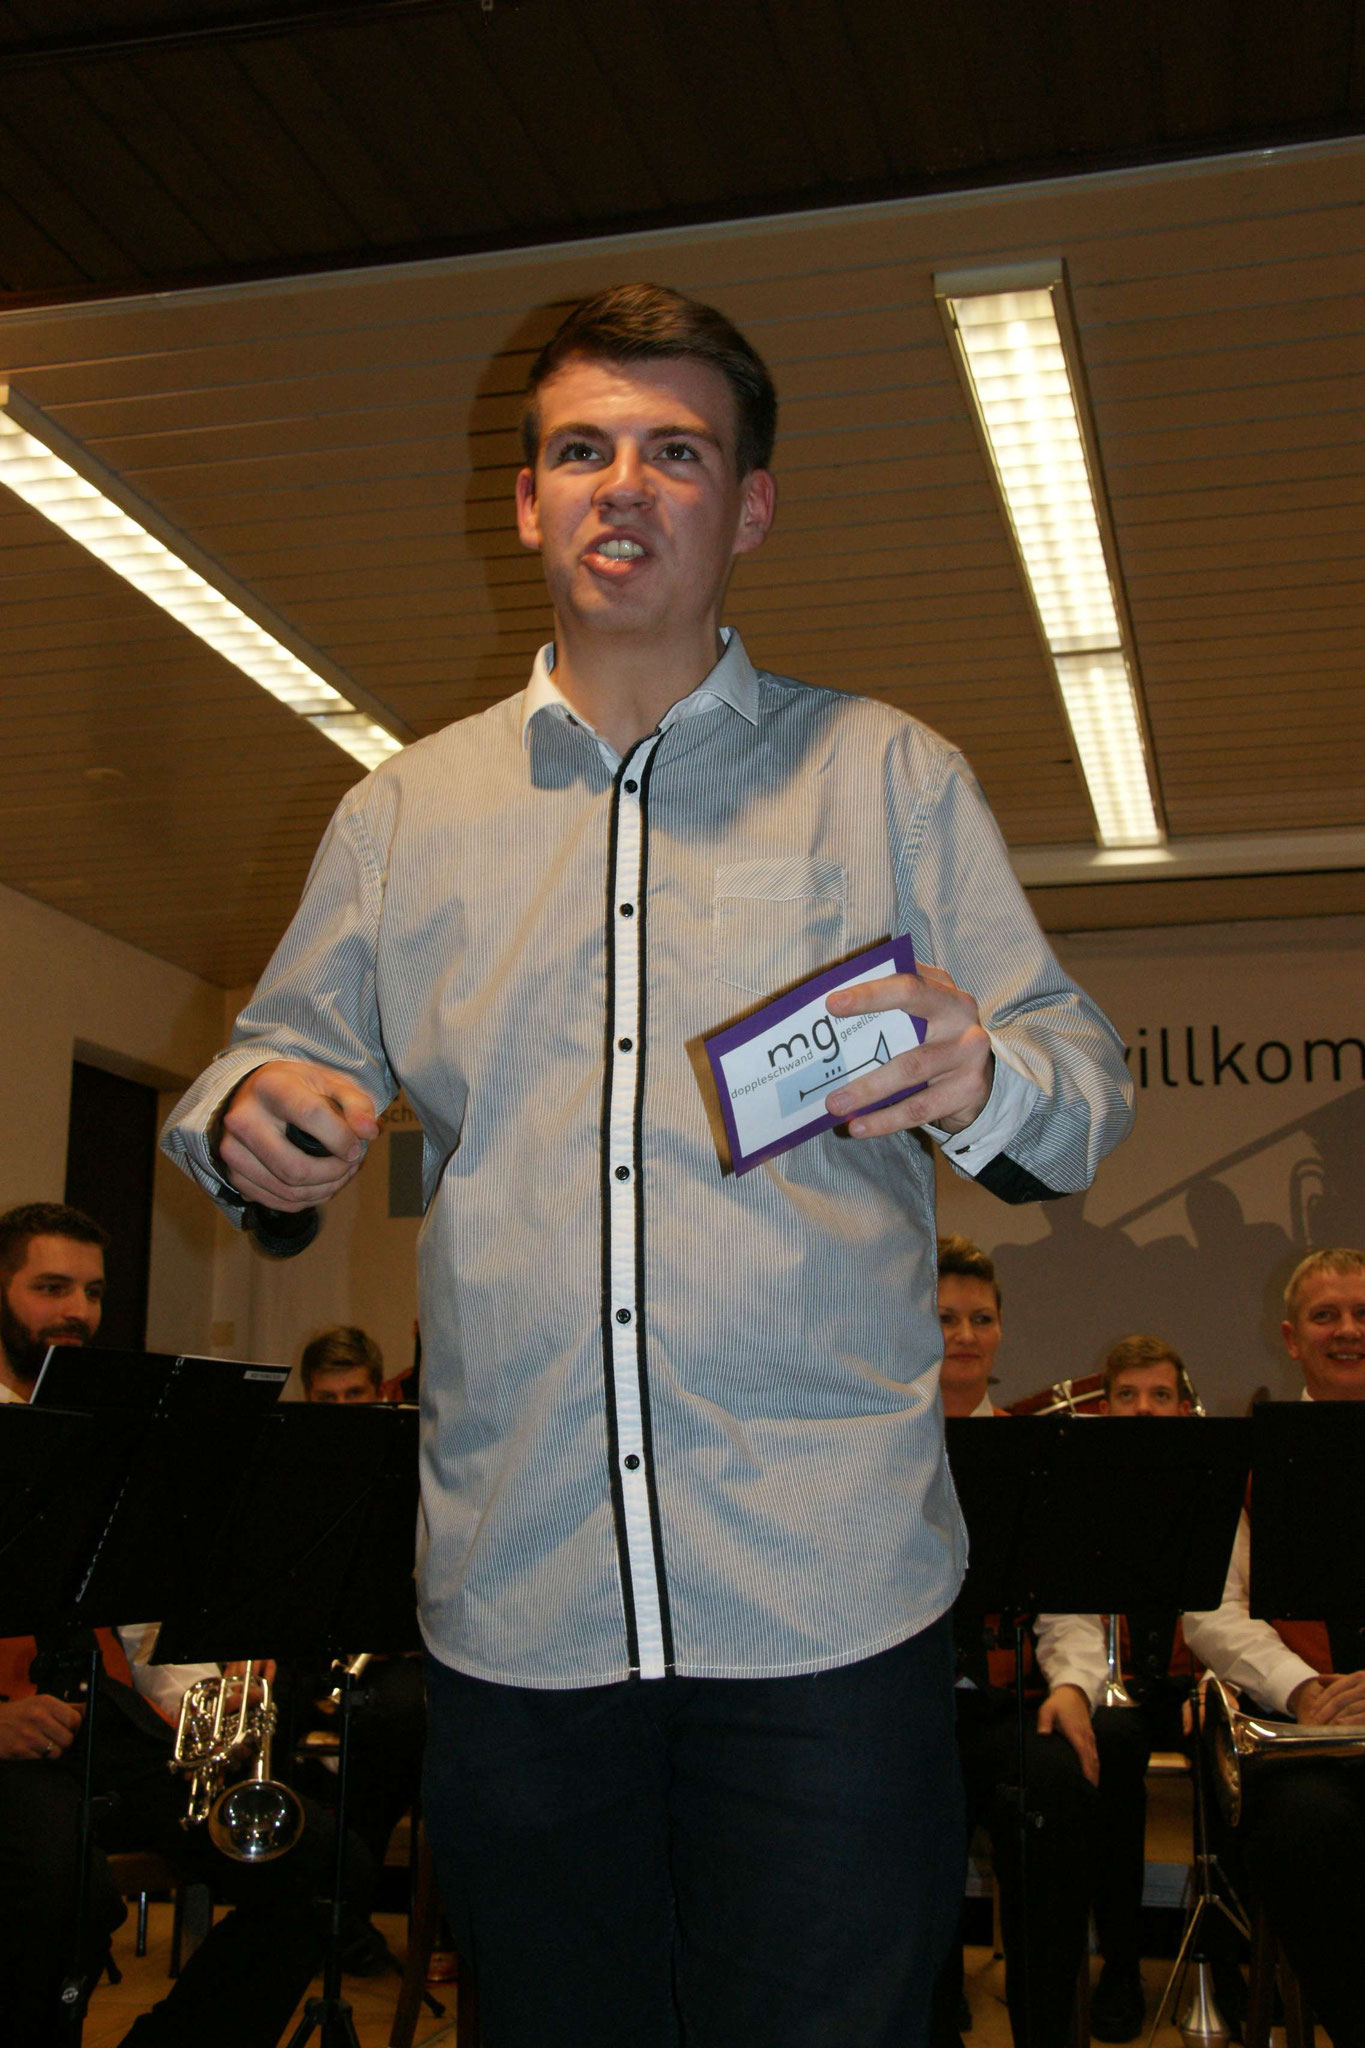 Konzertansage MG Doppleschwand, 2016